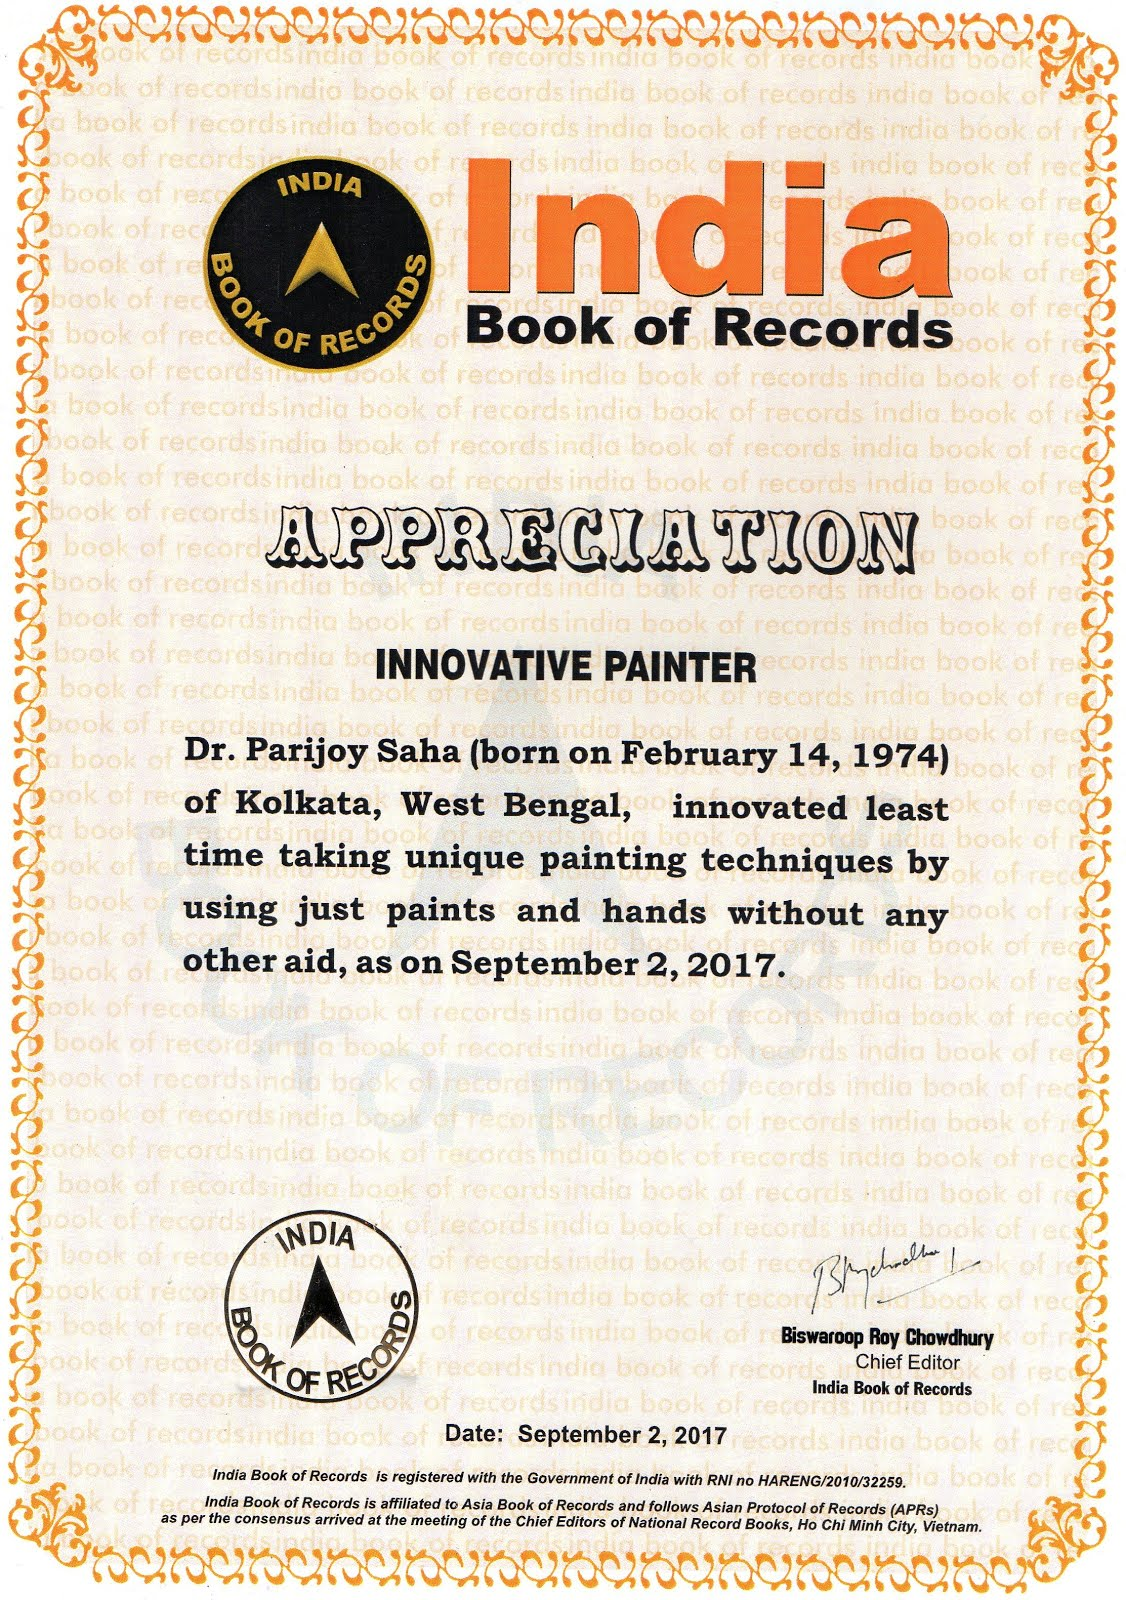 Innovative Painter Award